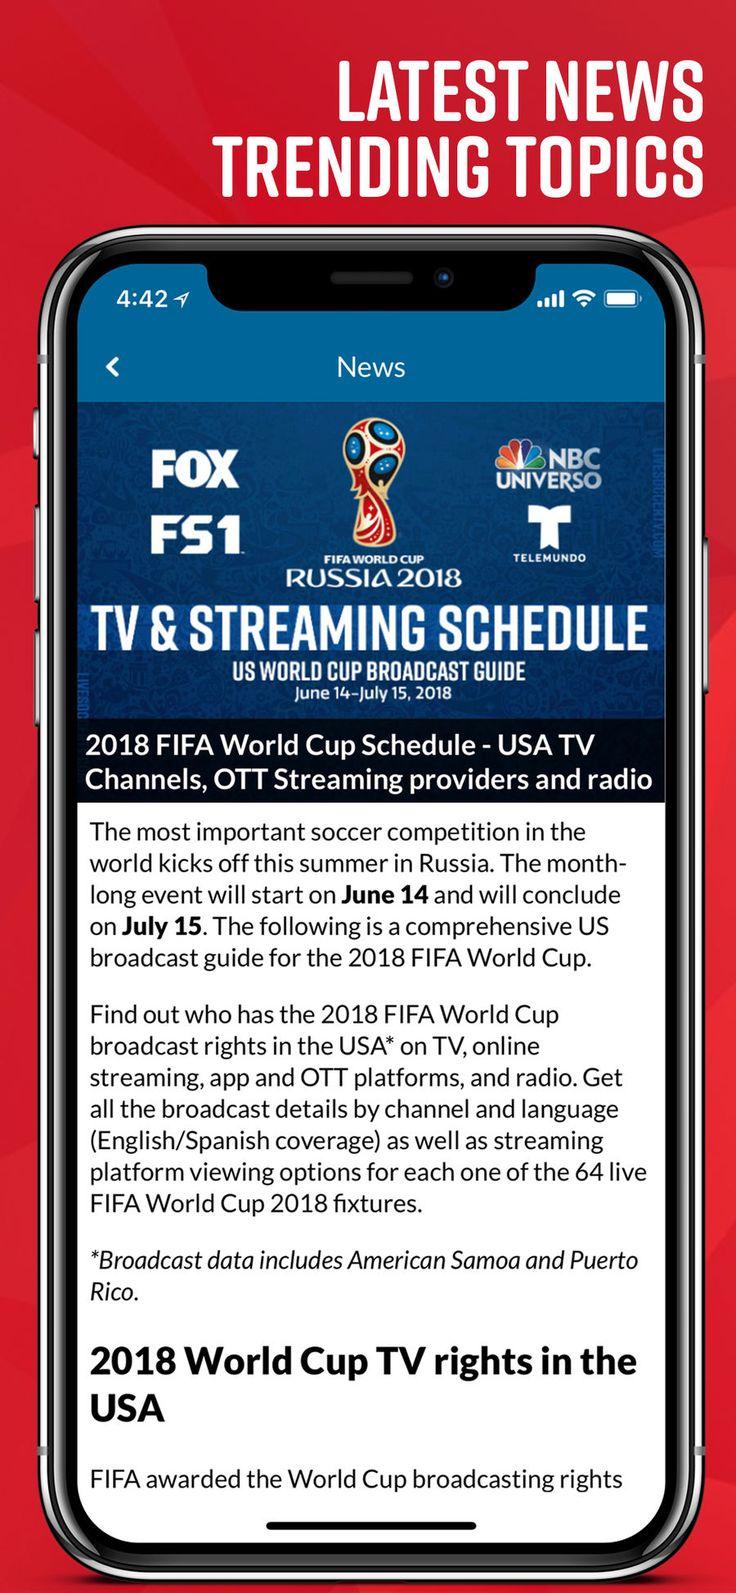 Live Soccer TV Scores Soccer tv, Live soccer, Streaming tv